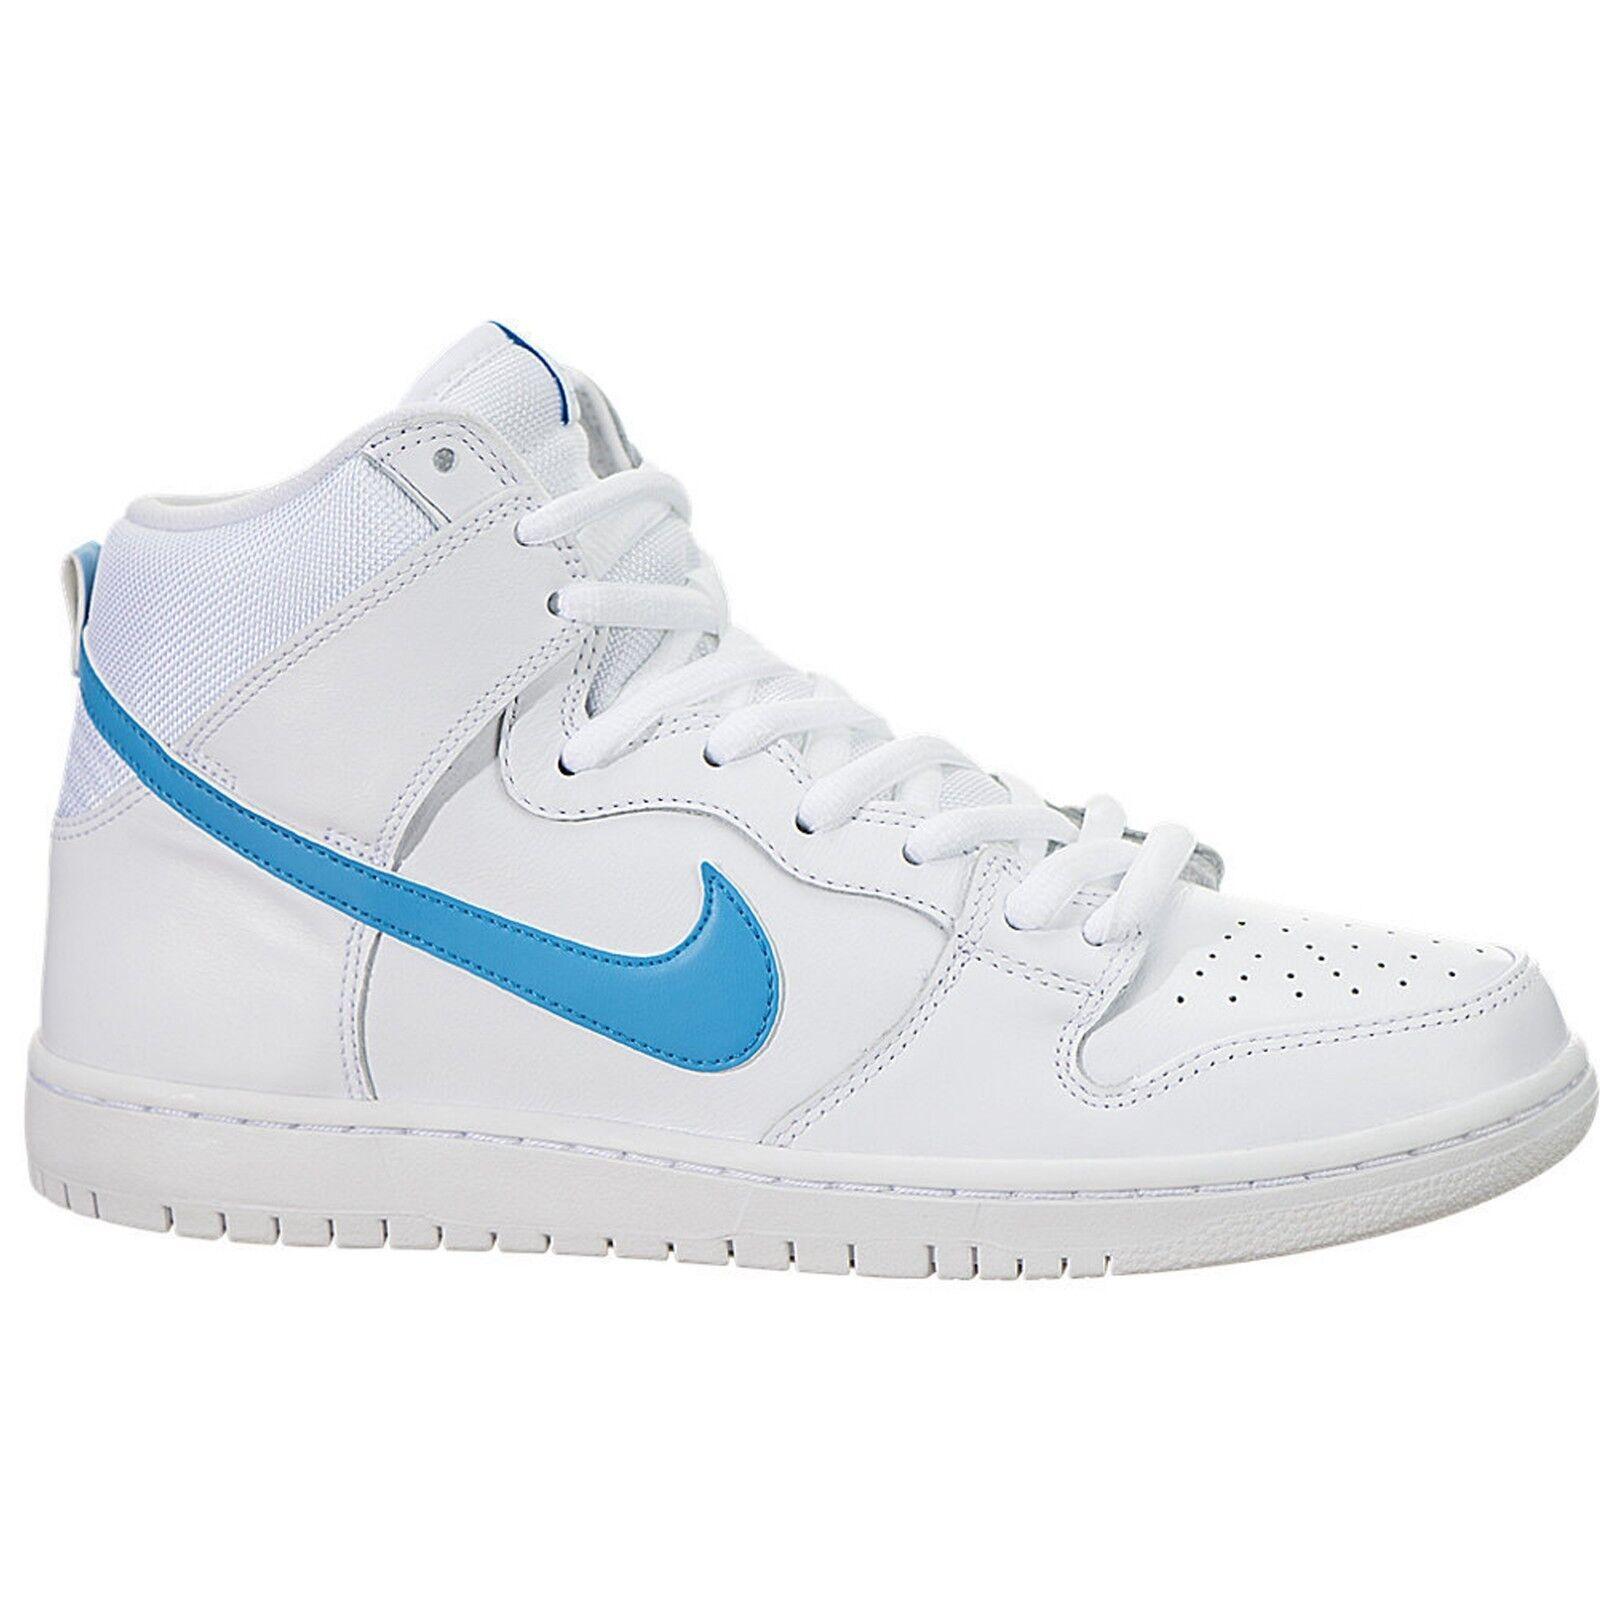 Nike Sb Dunk Hoch Trd Qs Blau Richard Mulder Weiß Orion Blau Qs 881758-141 Größe 8 La 5ea2e2